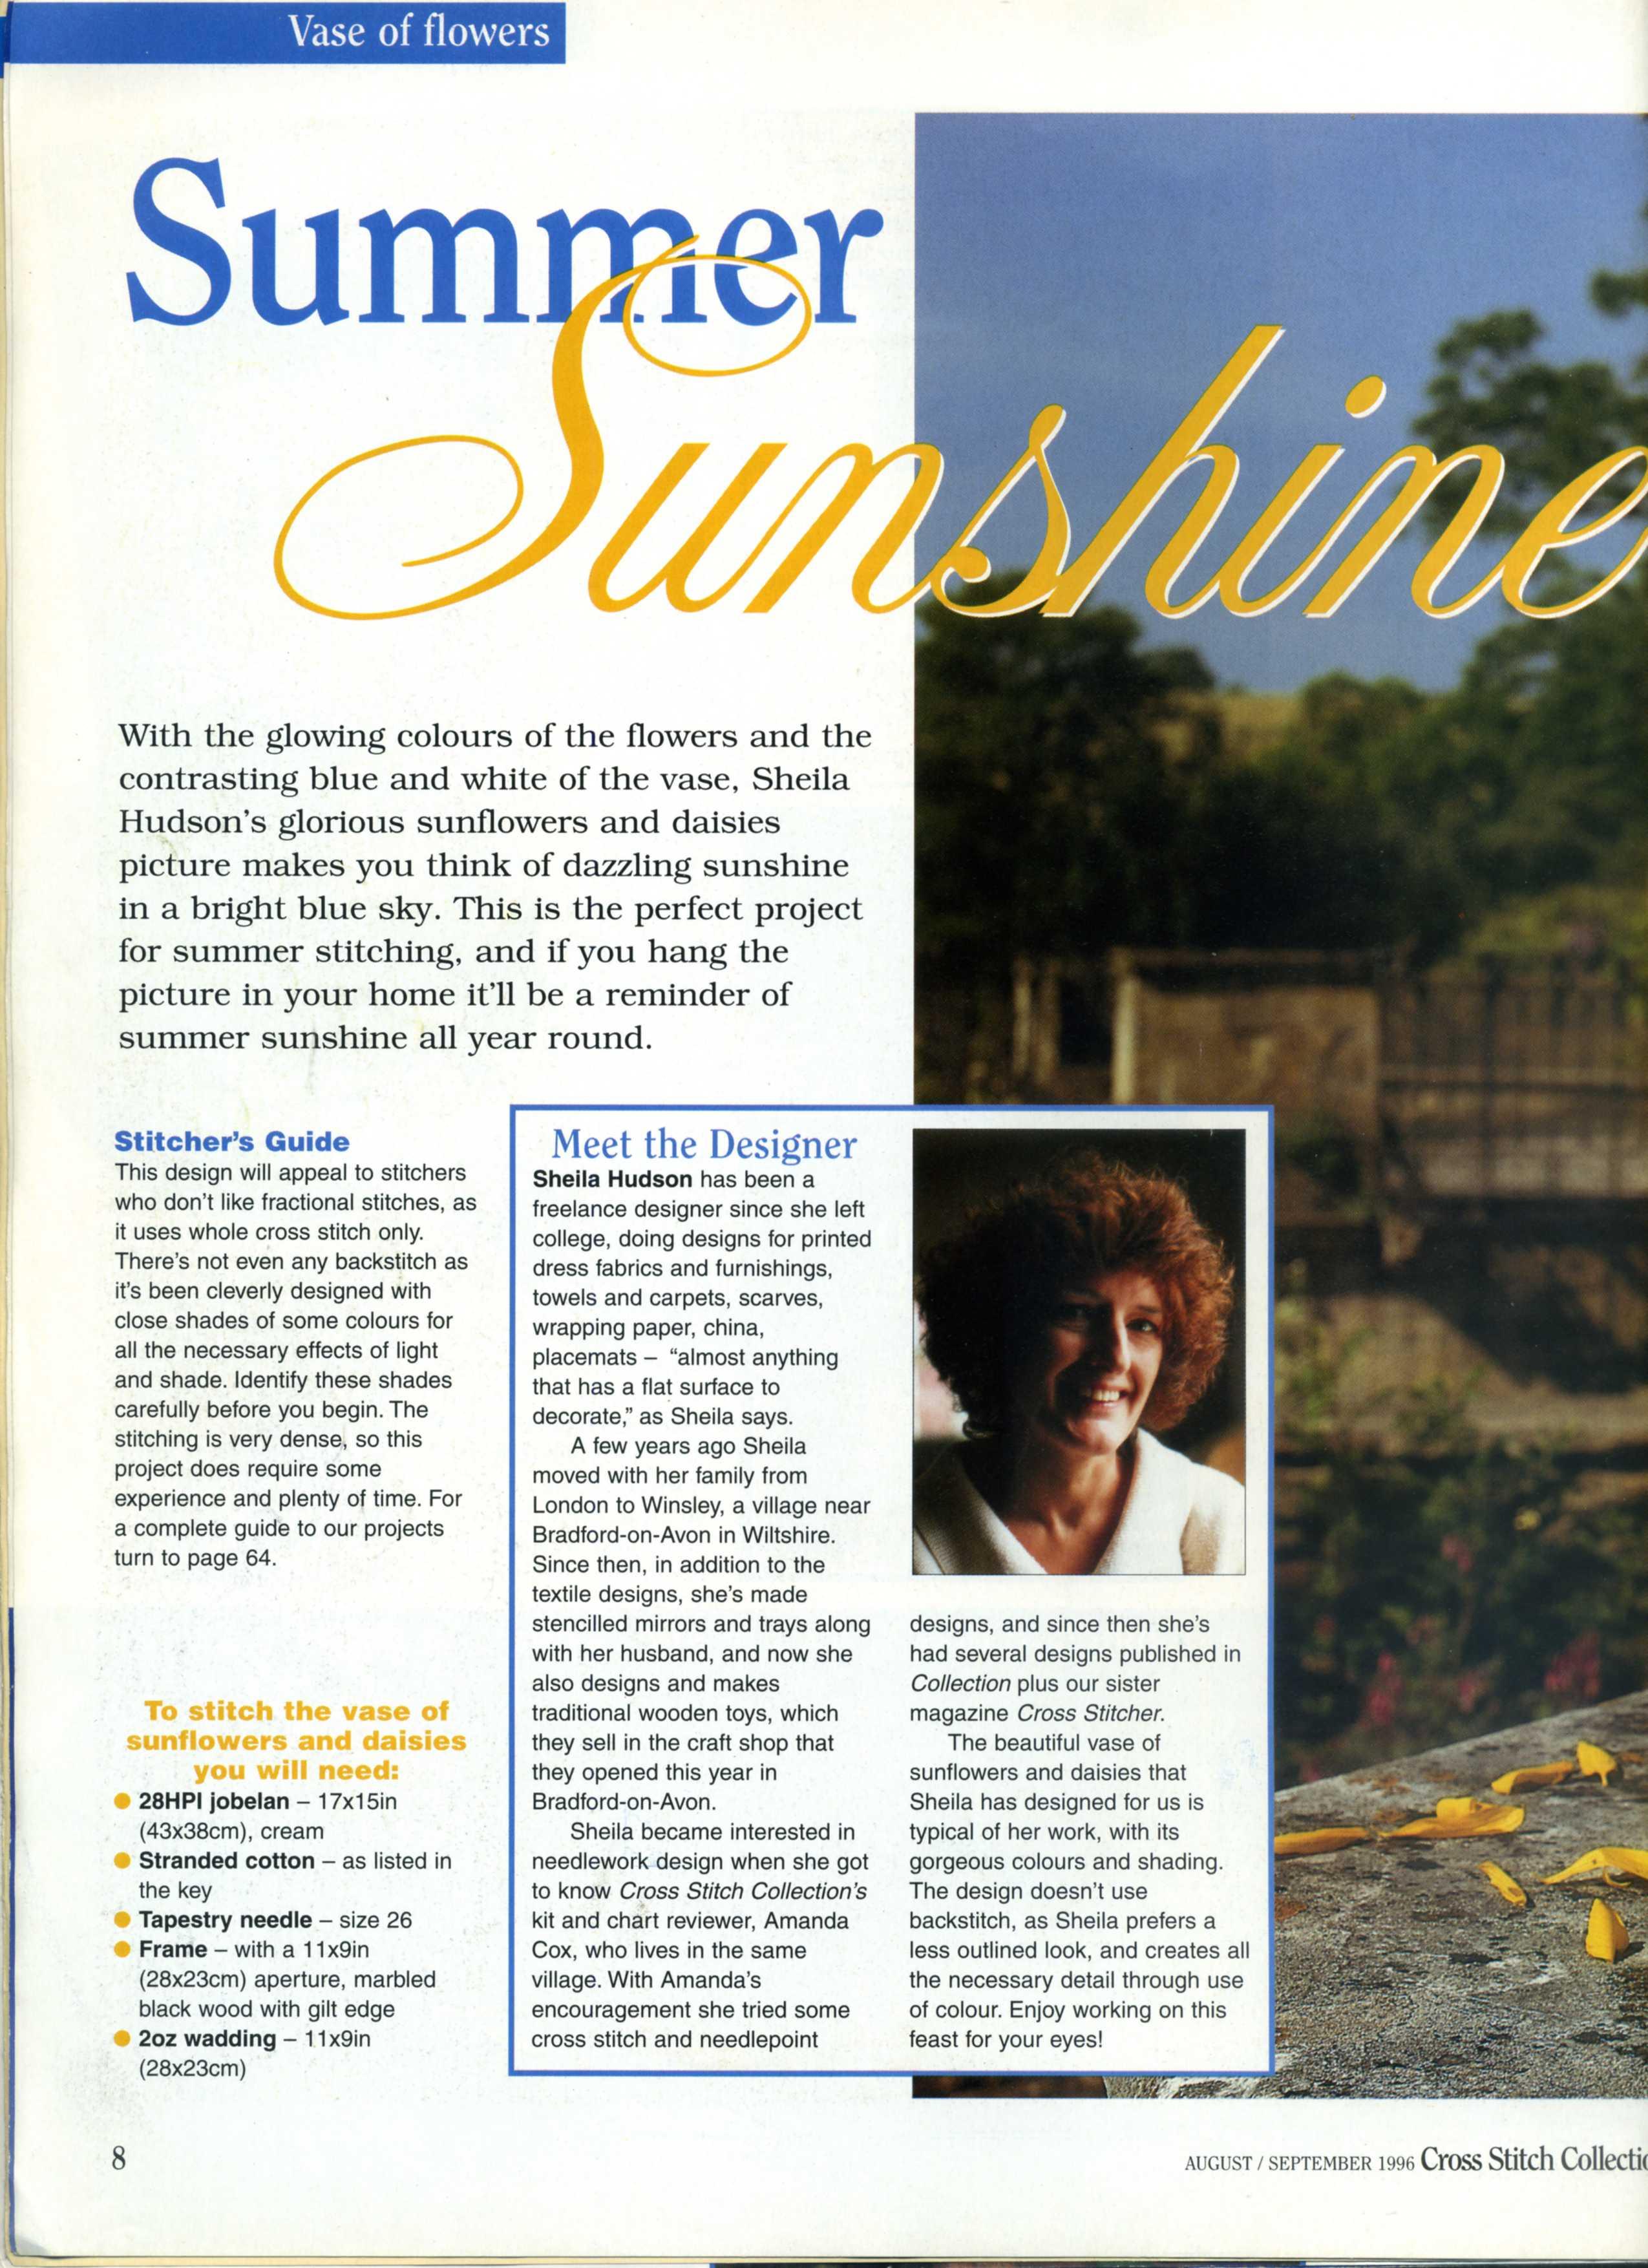 Cross Stitch collection - Summer sunshine (7)